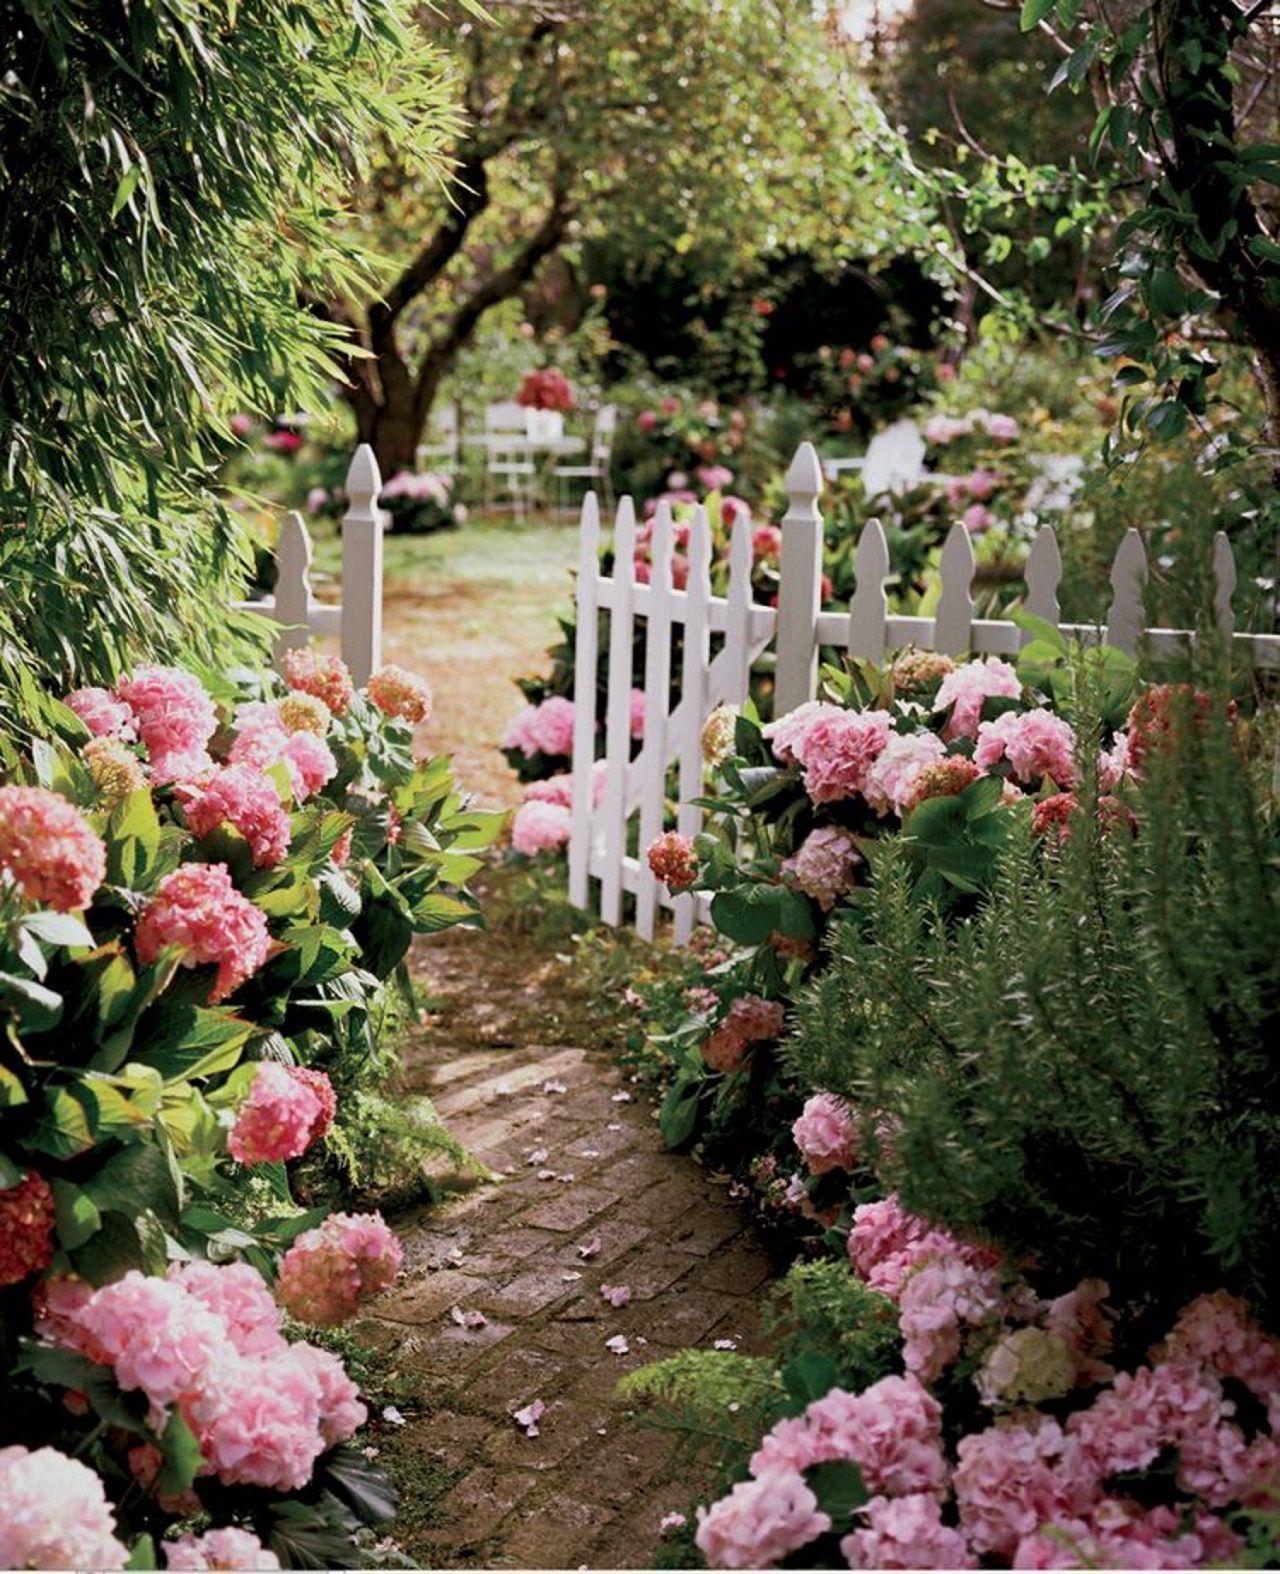 Affordable Beautiful Garden Path For Your Garden 31 Affordable Beautiful Garden Path For Your Garden 31 Design Ideas And Photos Beautiful Flowers Garden Hydrangea Garden Gorgeous Gardens